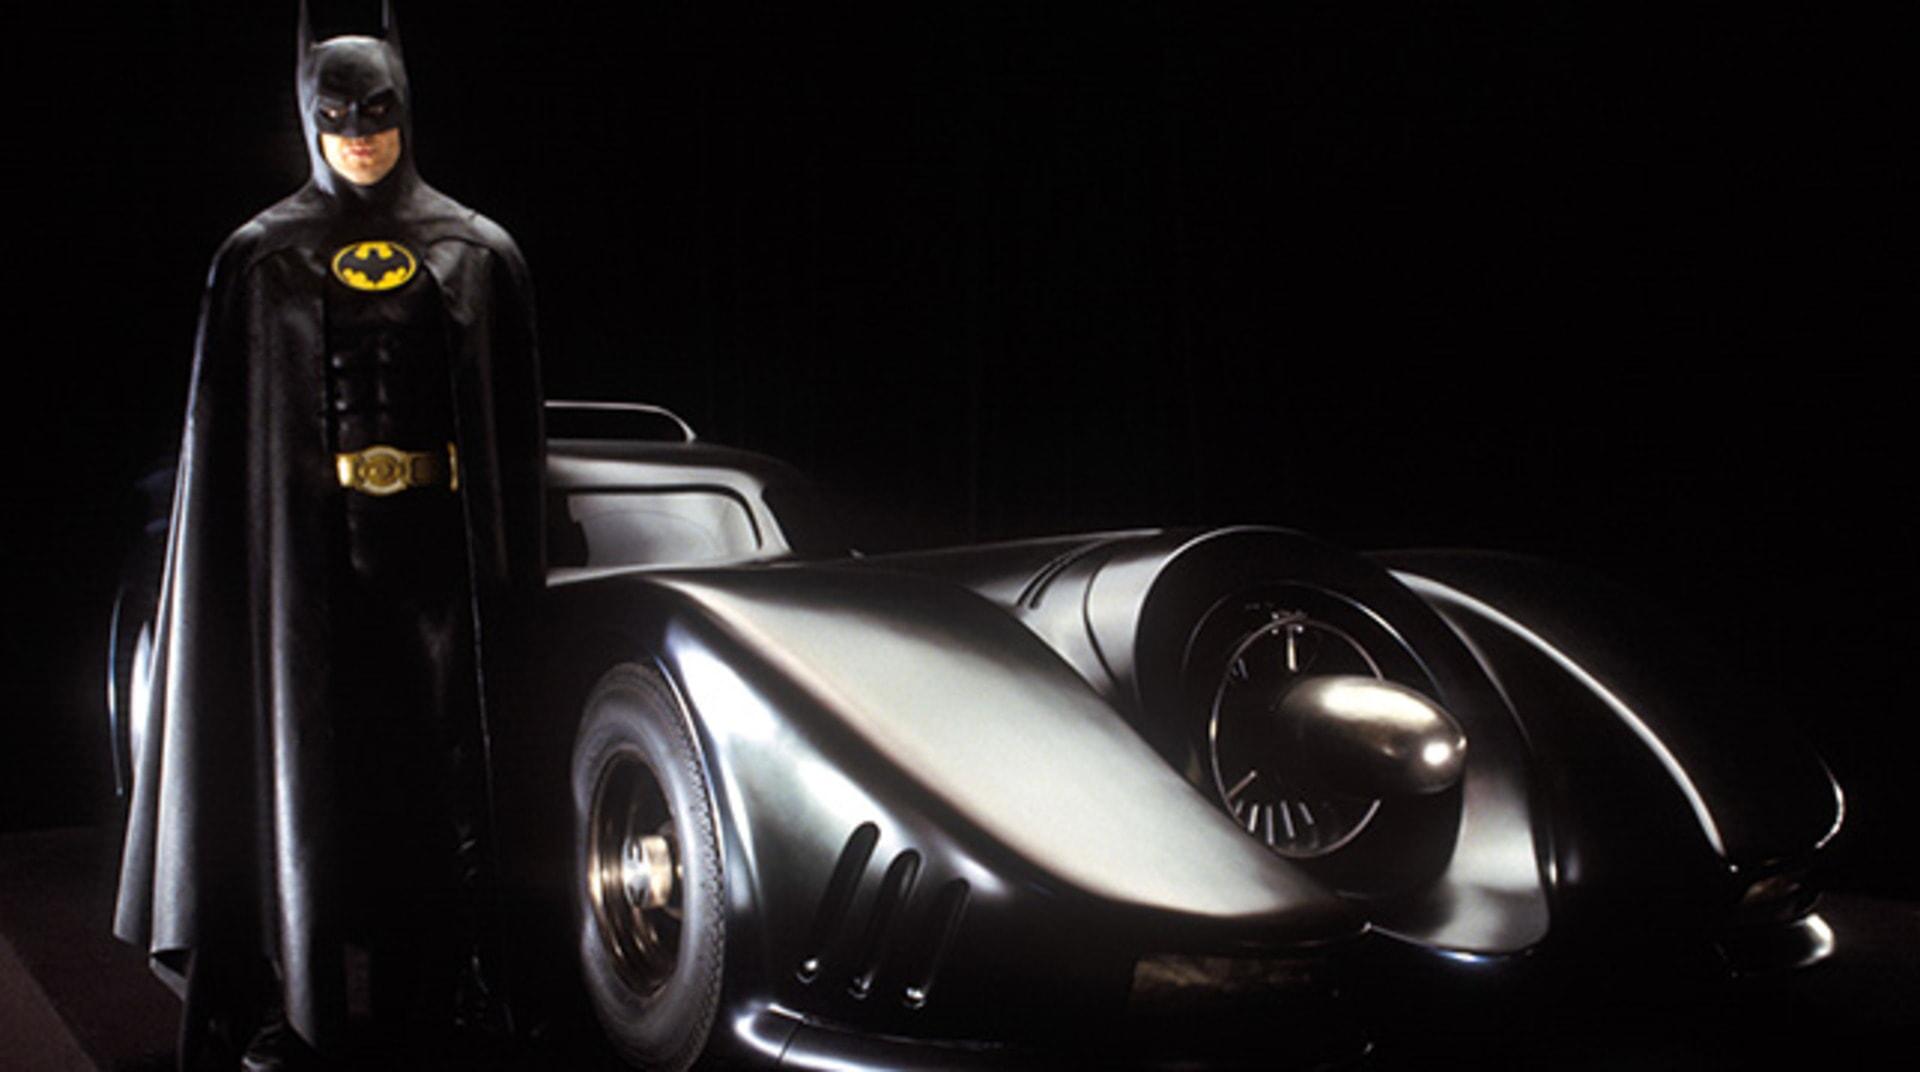 Batman - Image 14